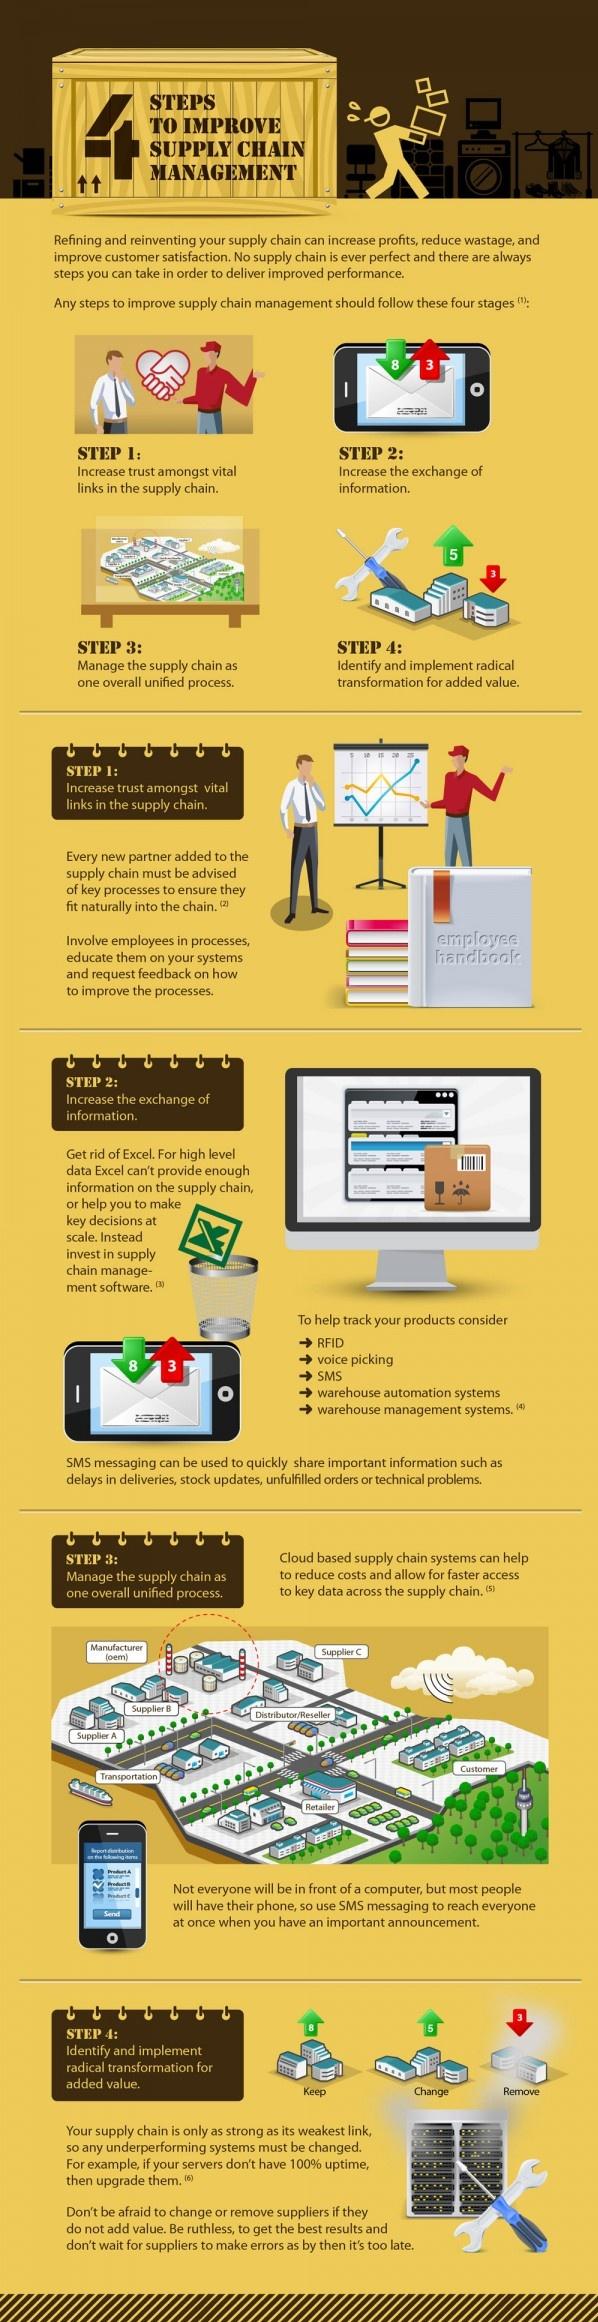 4 Steps to SCM eJ SCM Consulting